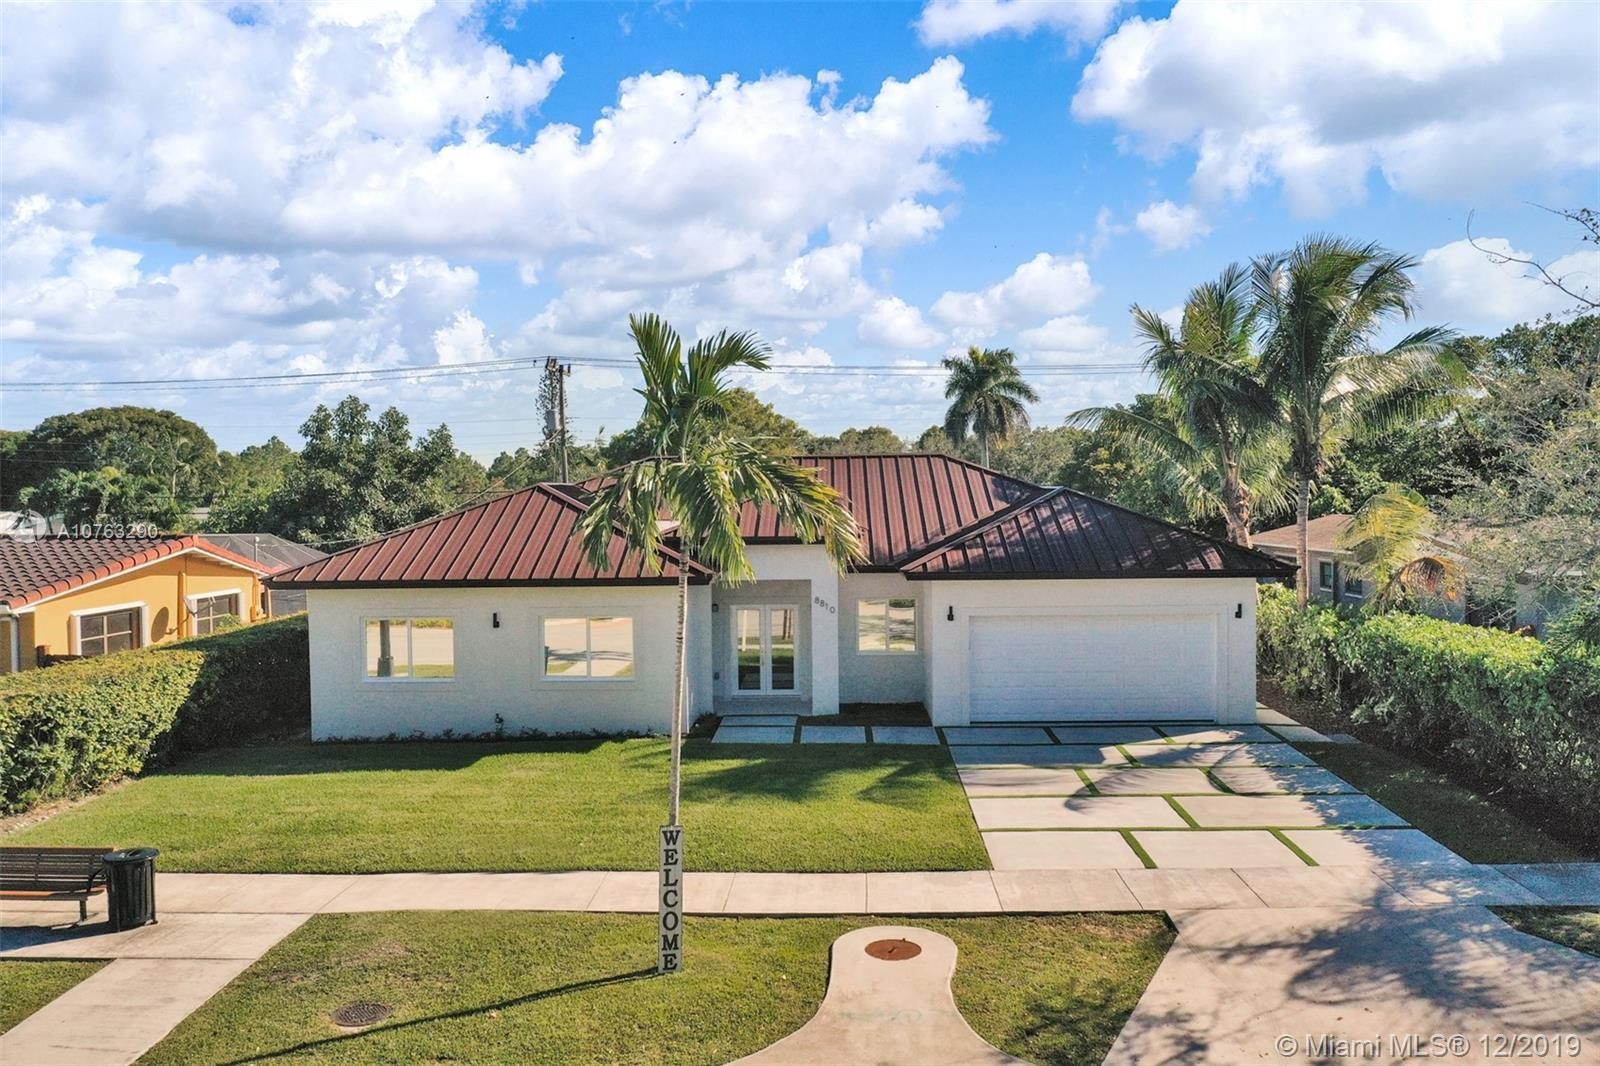 8810 Caribbean Blvd, Cutler Bay, FL 33157 - Cutler Bay, FL real estate listing